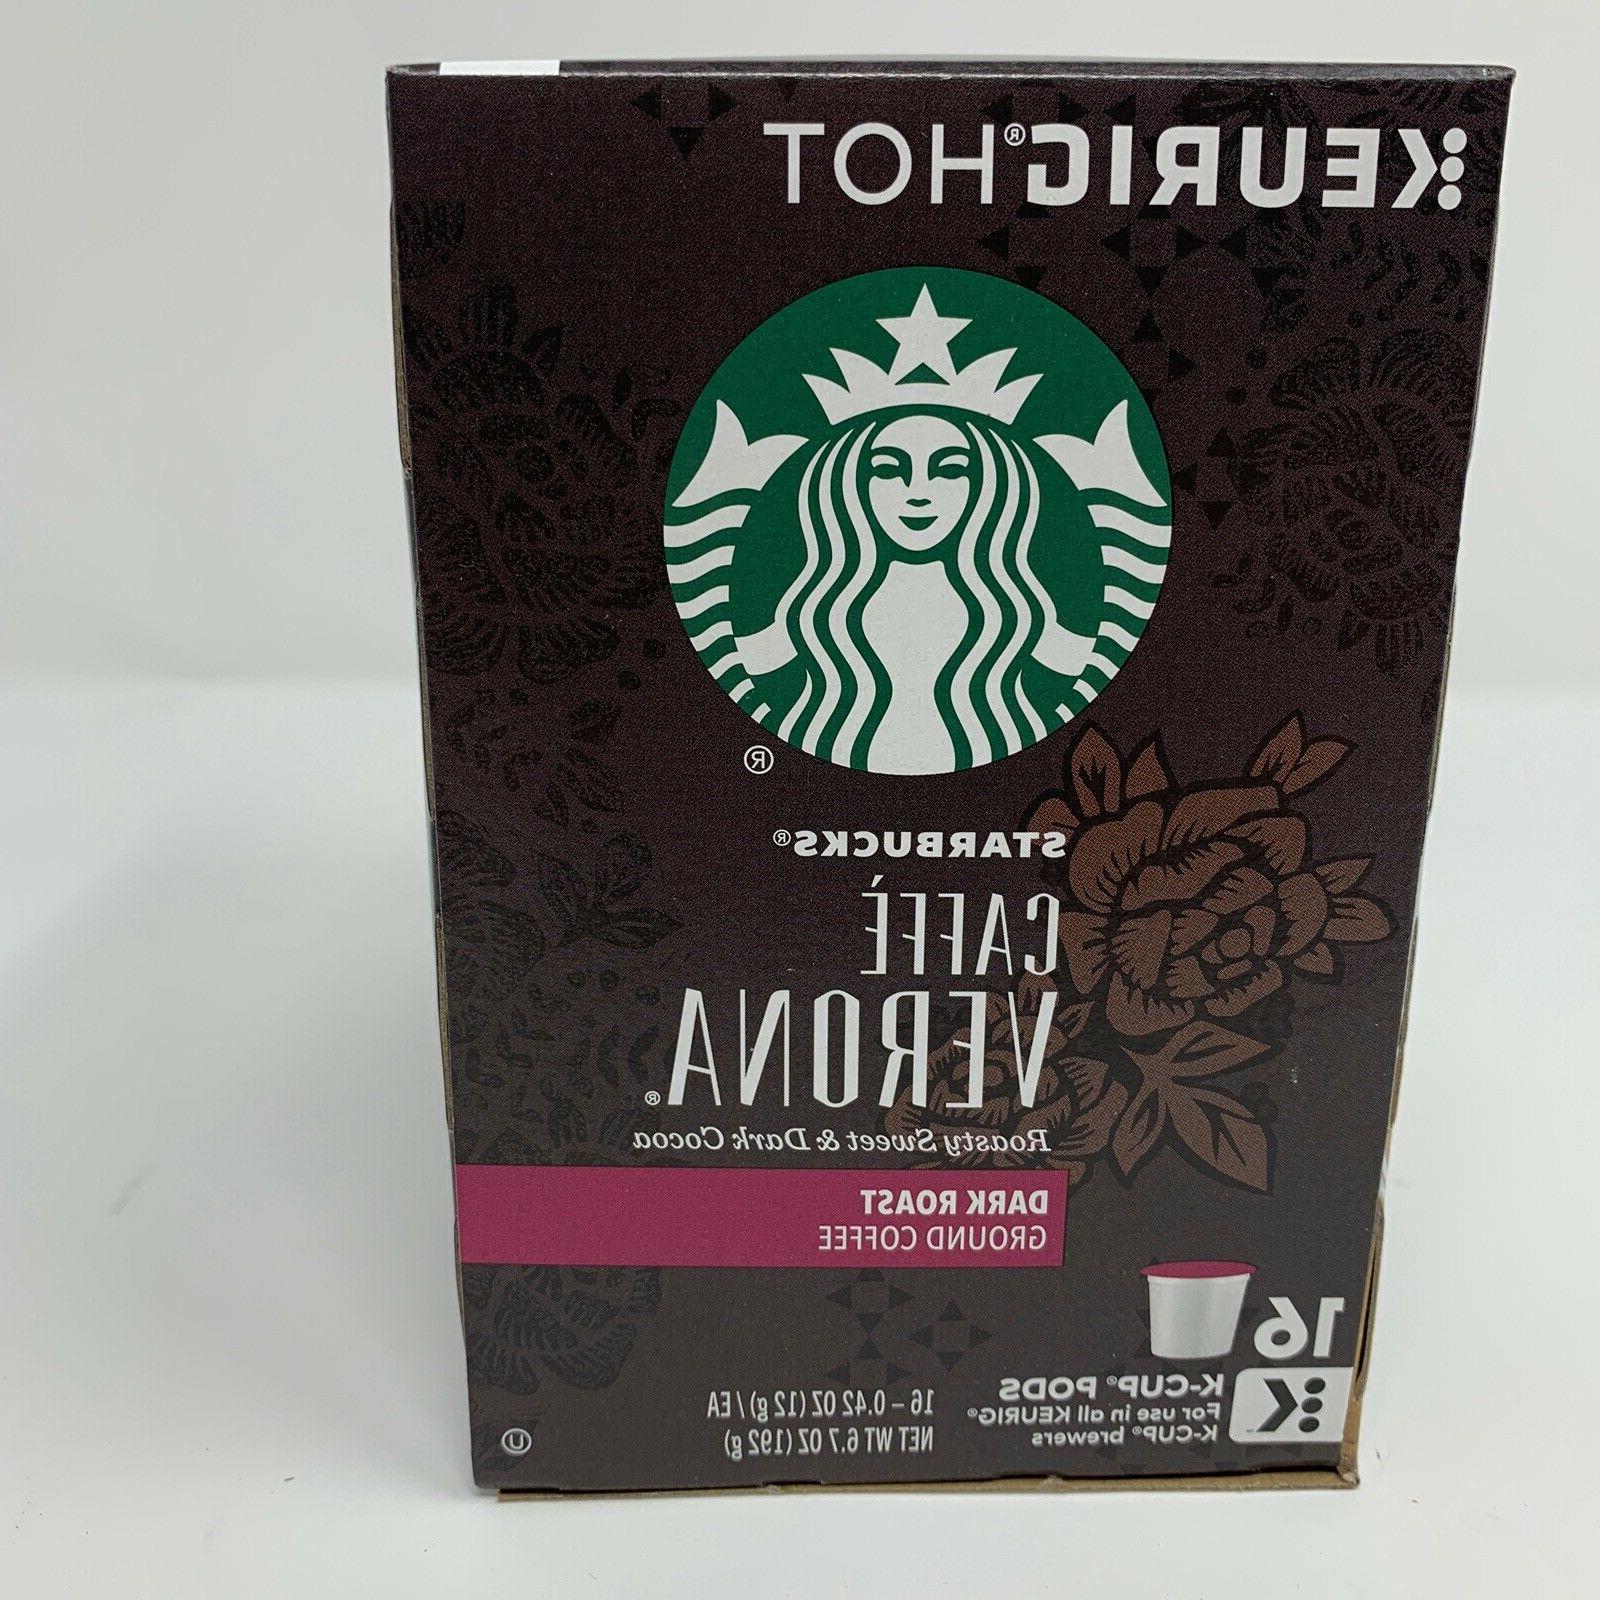 Starbucks Dark Roast Coffee ct Best 10/9/19